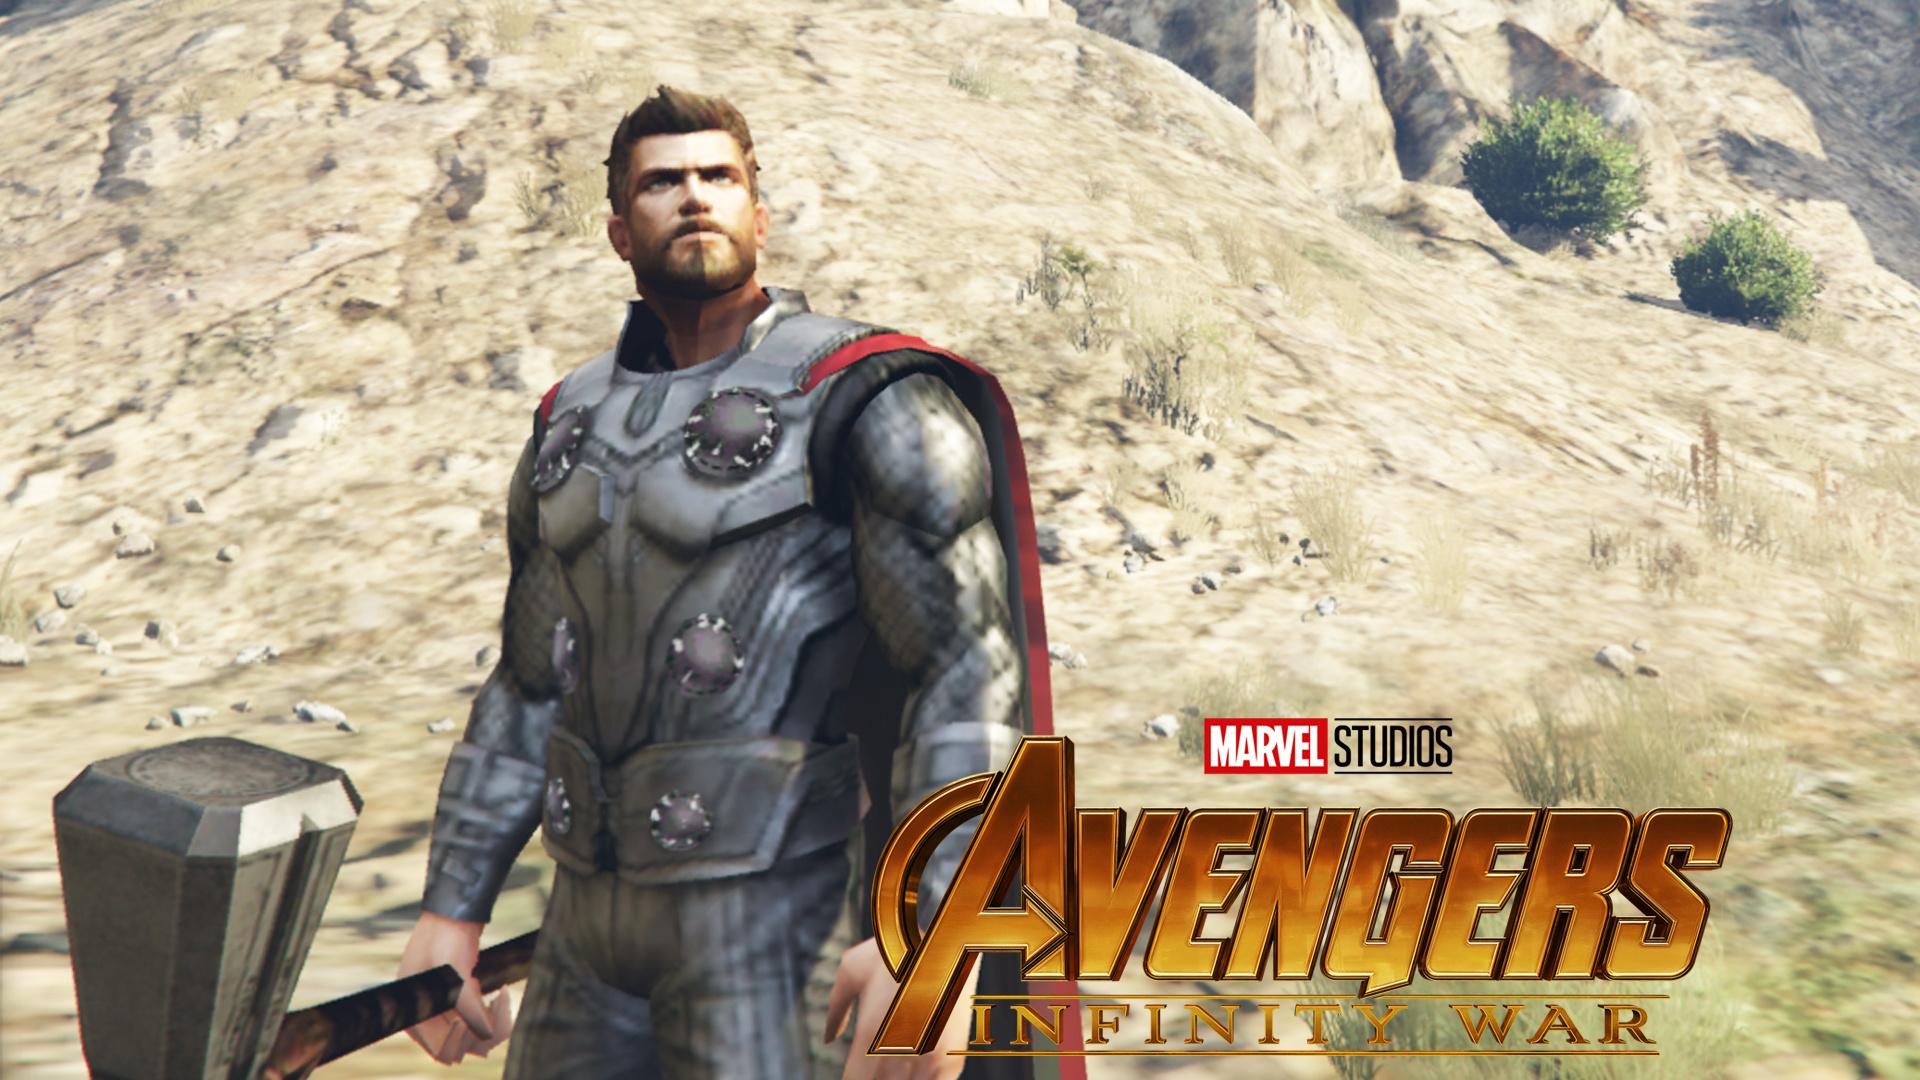 Thor Avengers Infinity War Turn On Off Cape Gta5 Mods Com